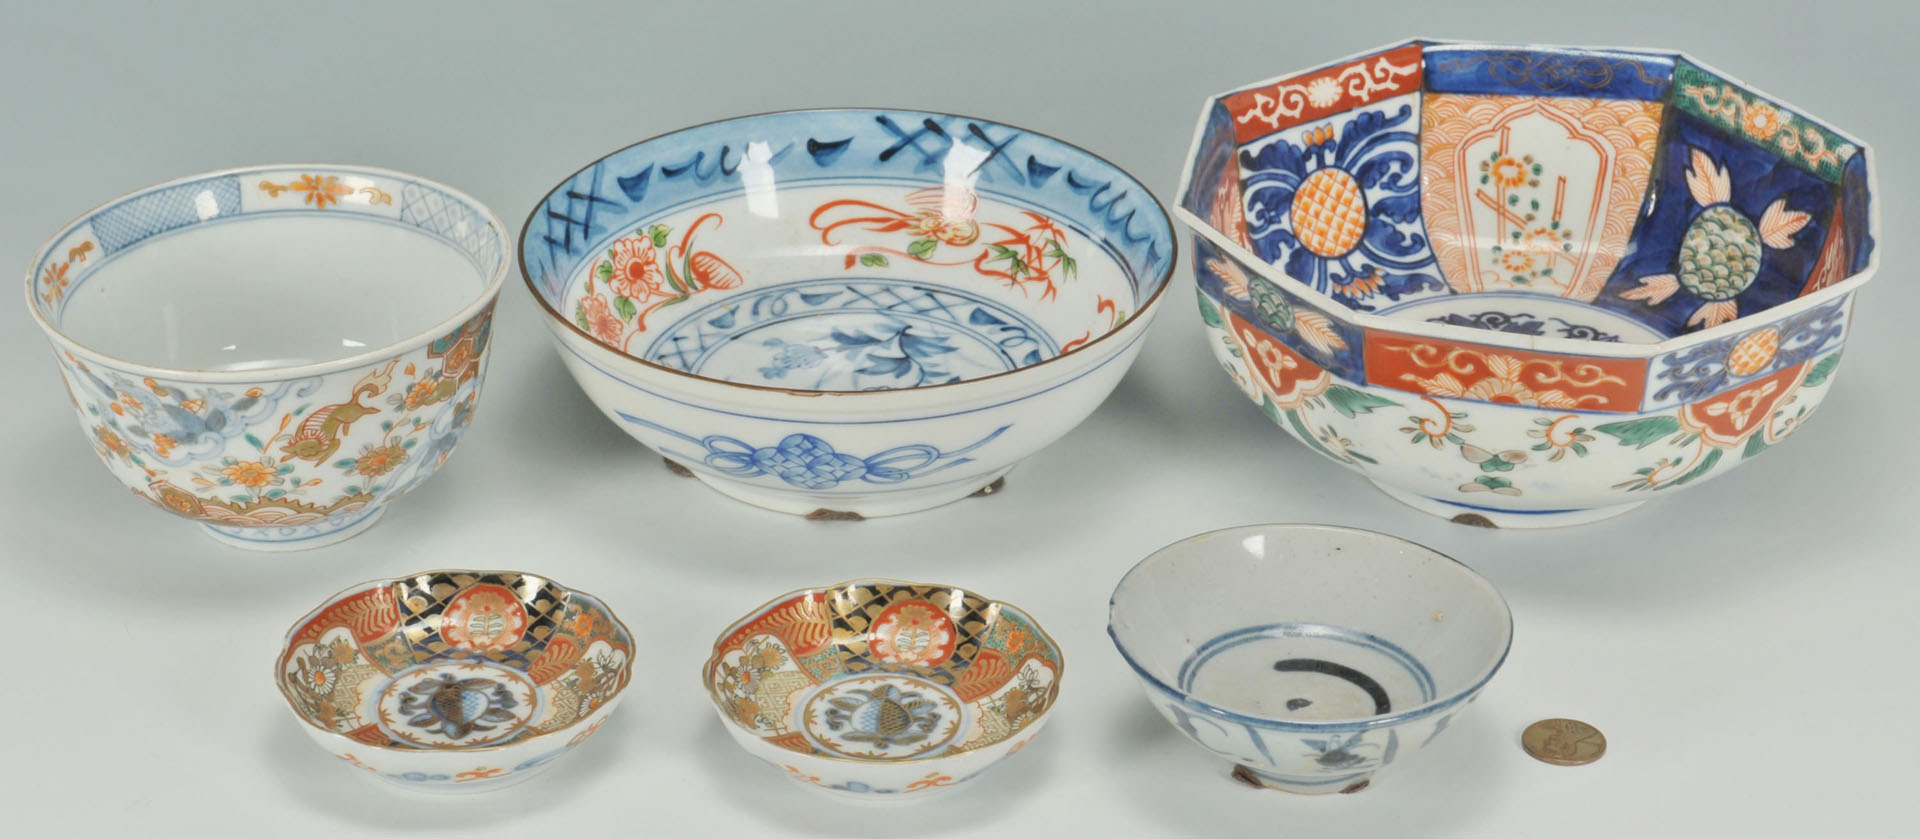 Lot 712: Group of 6 pcs Imari & Chinese porcelain